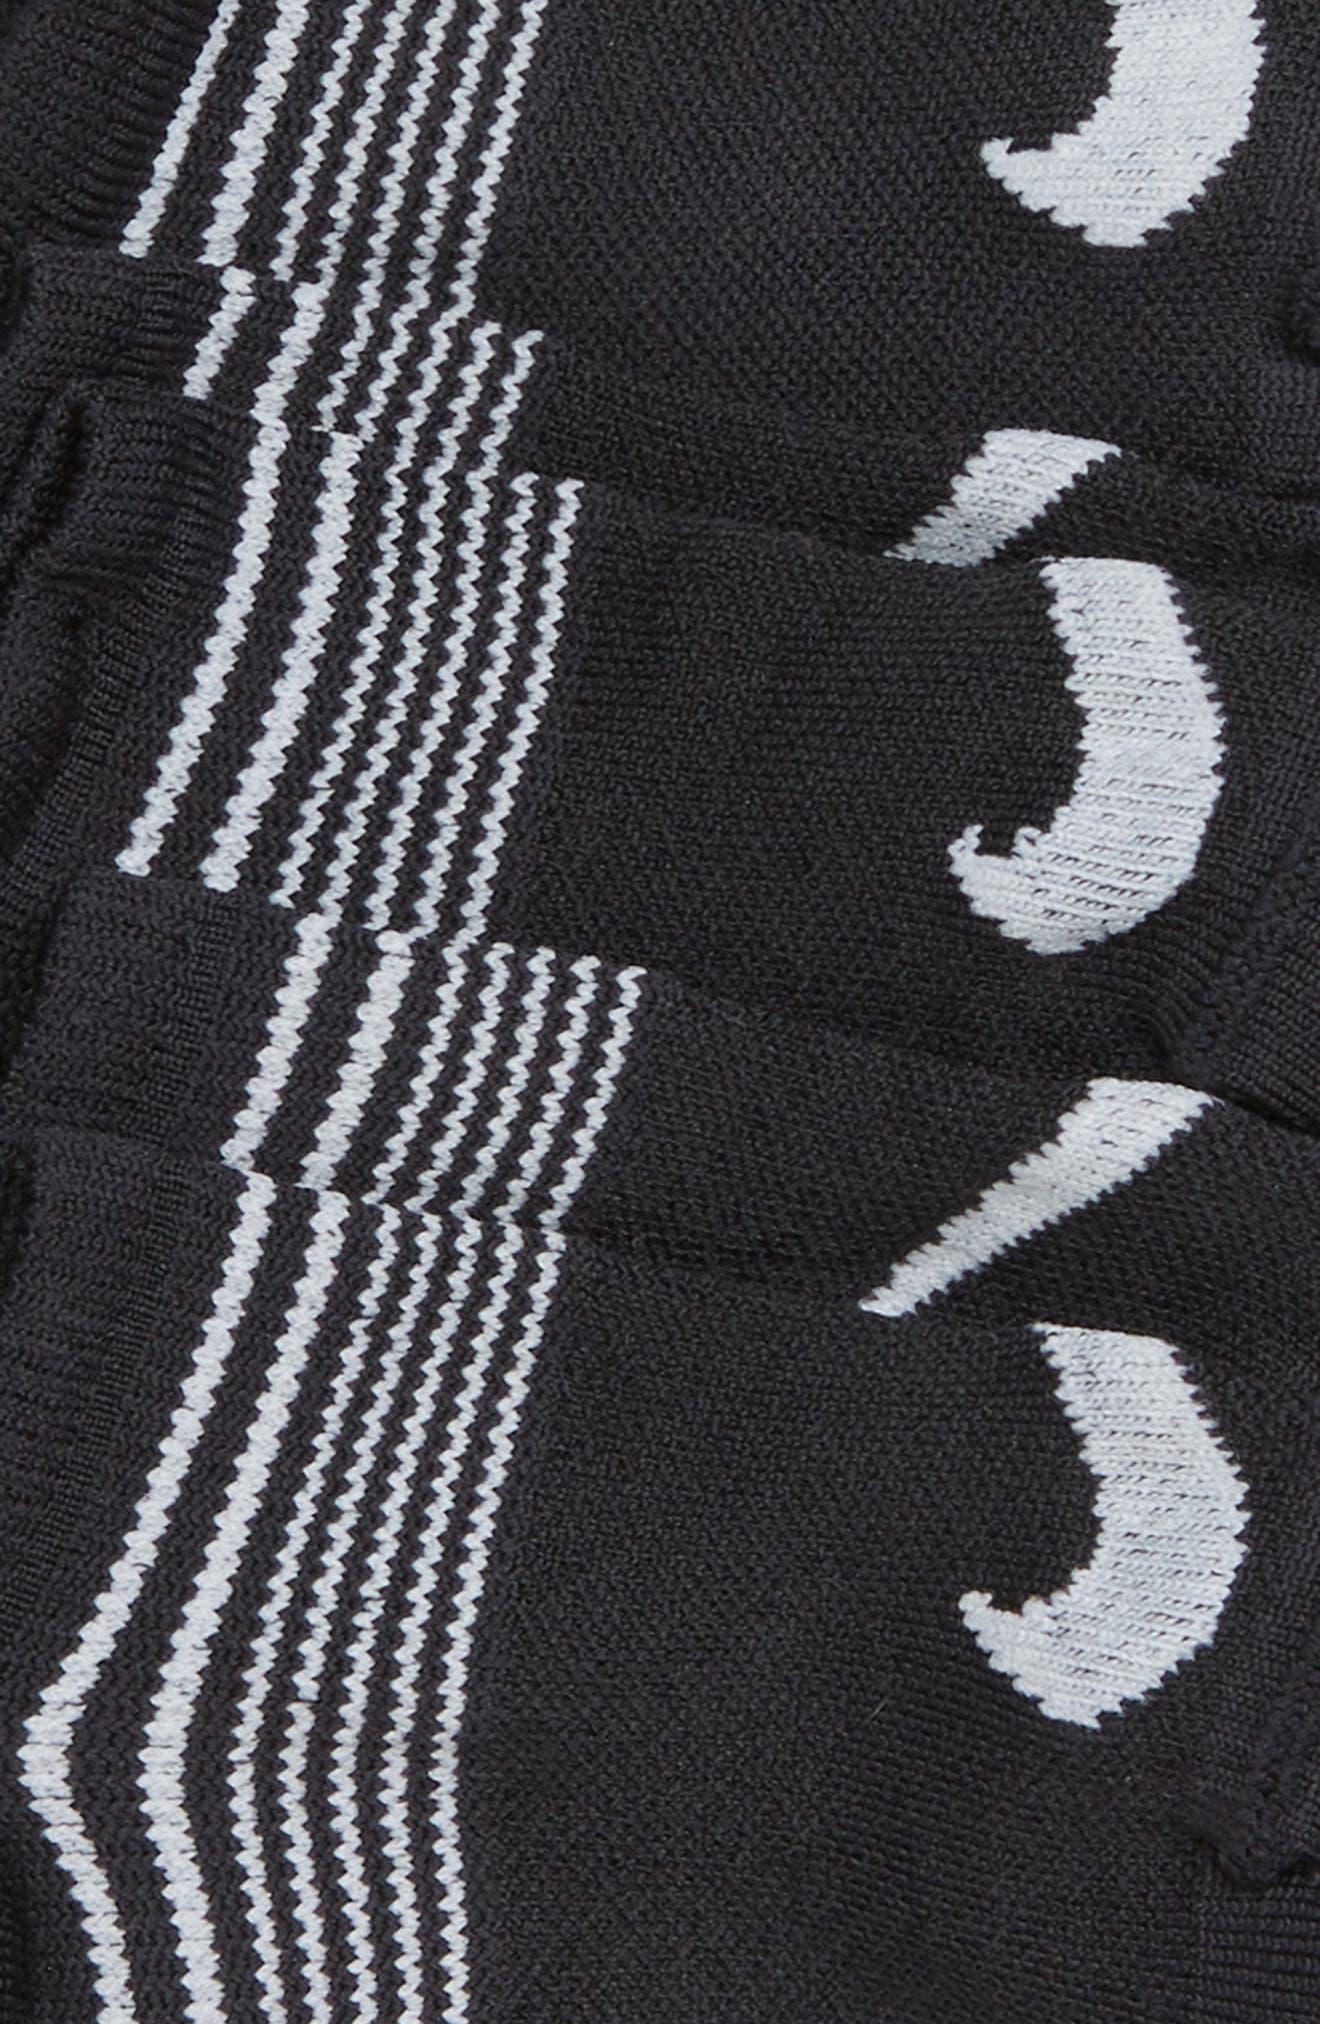 3-Pack No-Show Socks,                             Alternate thumbnail 2, color,                             BLACK/ WHITE